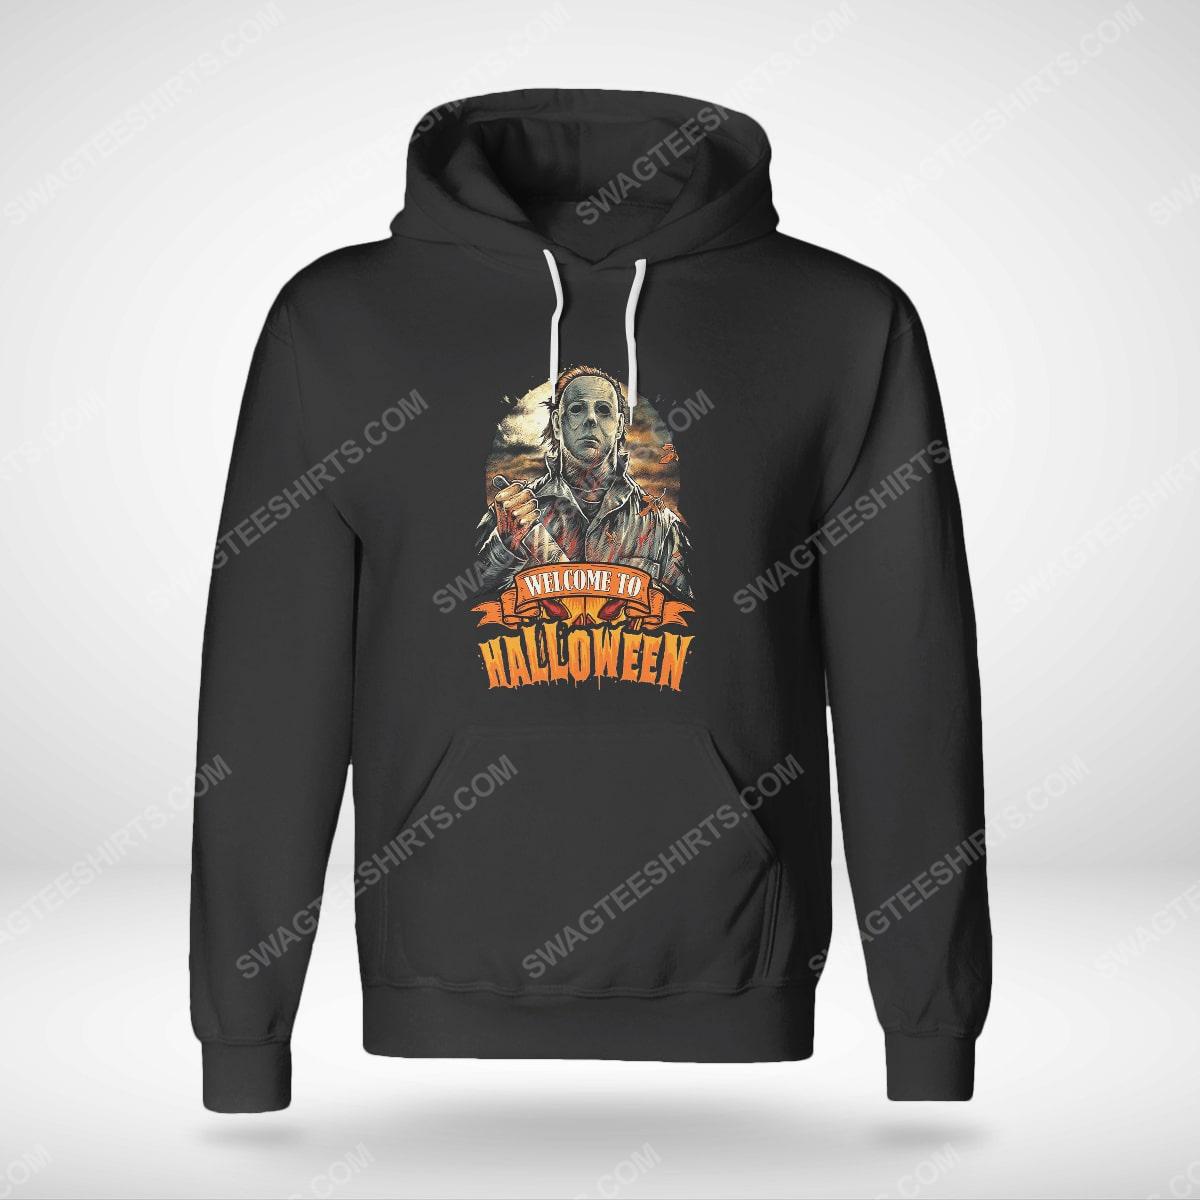 Vintage michael myers welcome to halloween hoodie(1)